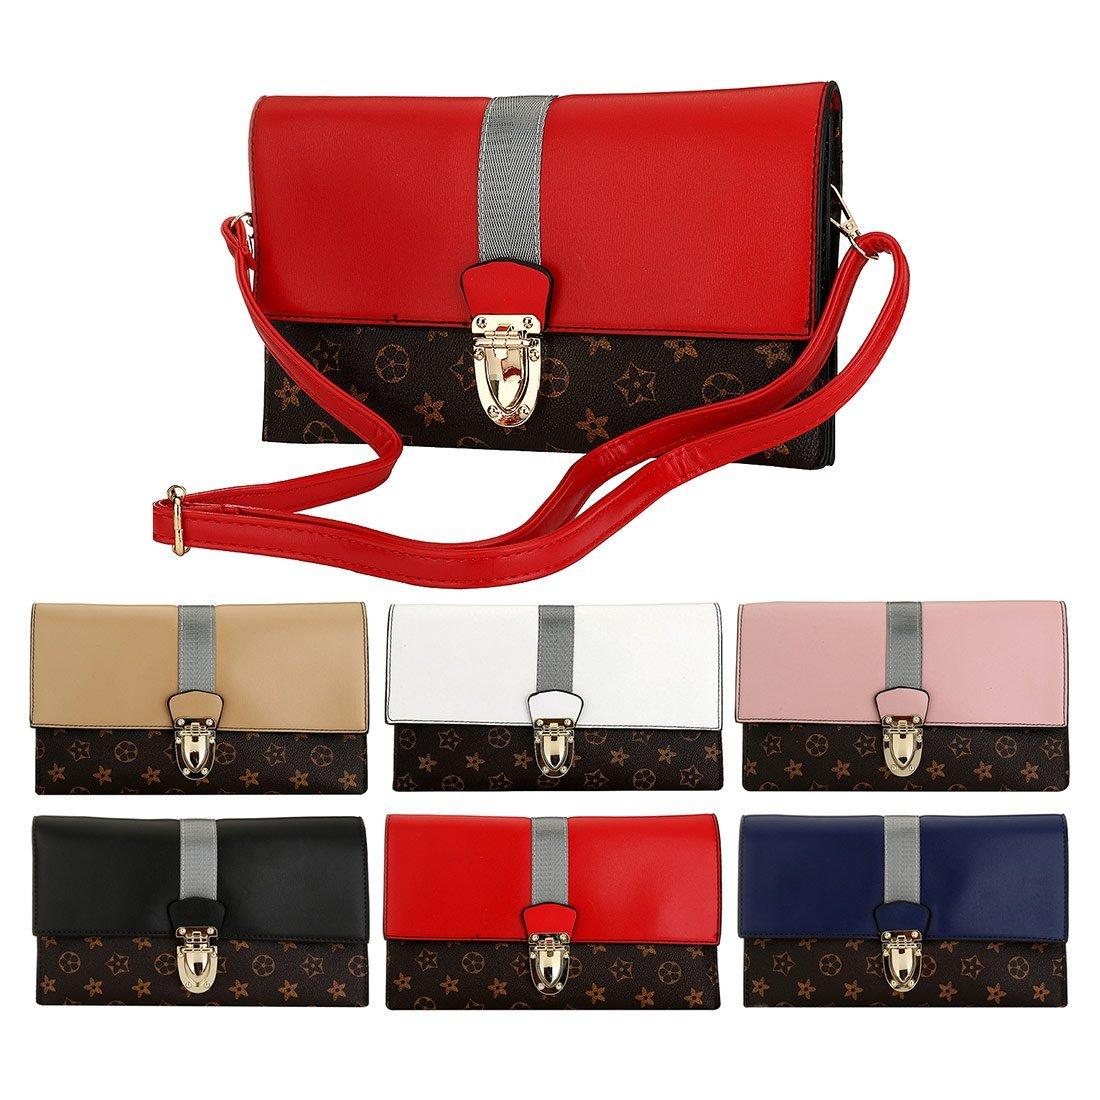 Designer Evening Bag Women Oversized Flower Retro Stripe Evening Clutch Handbag Wristlet Purse Crossbody Bags with Adjustable Strap Black